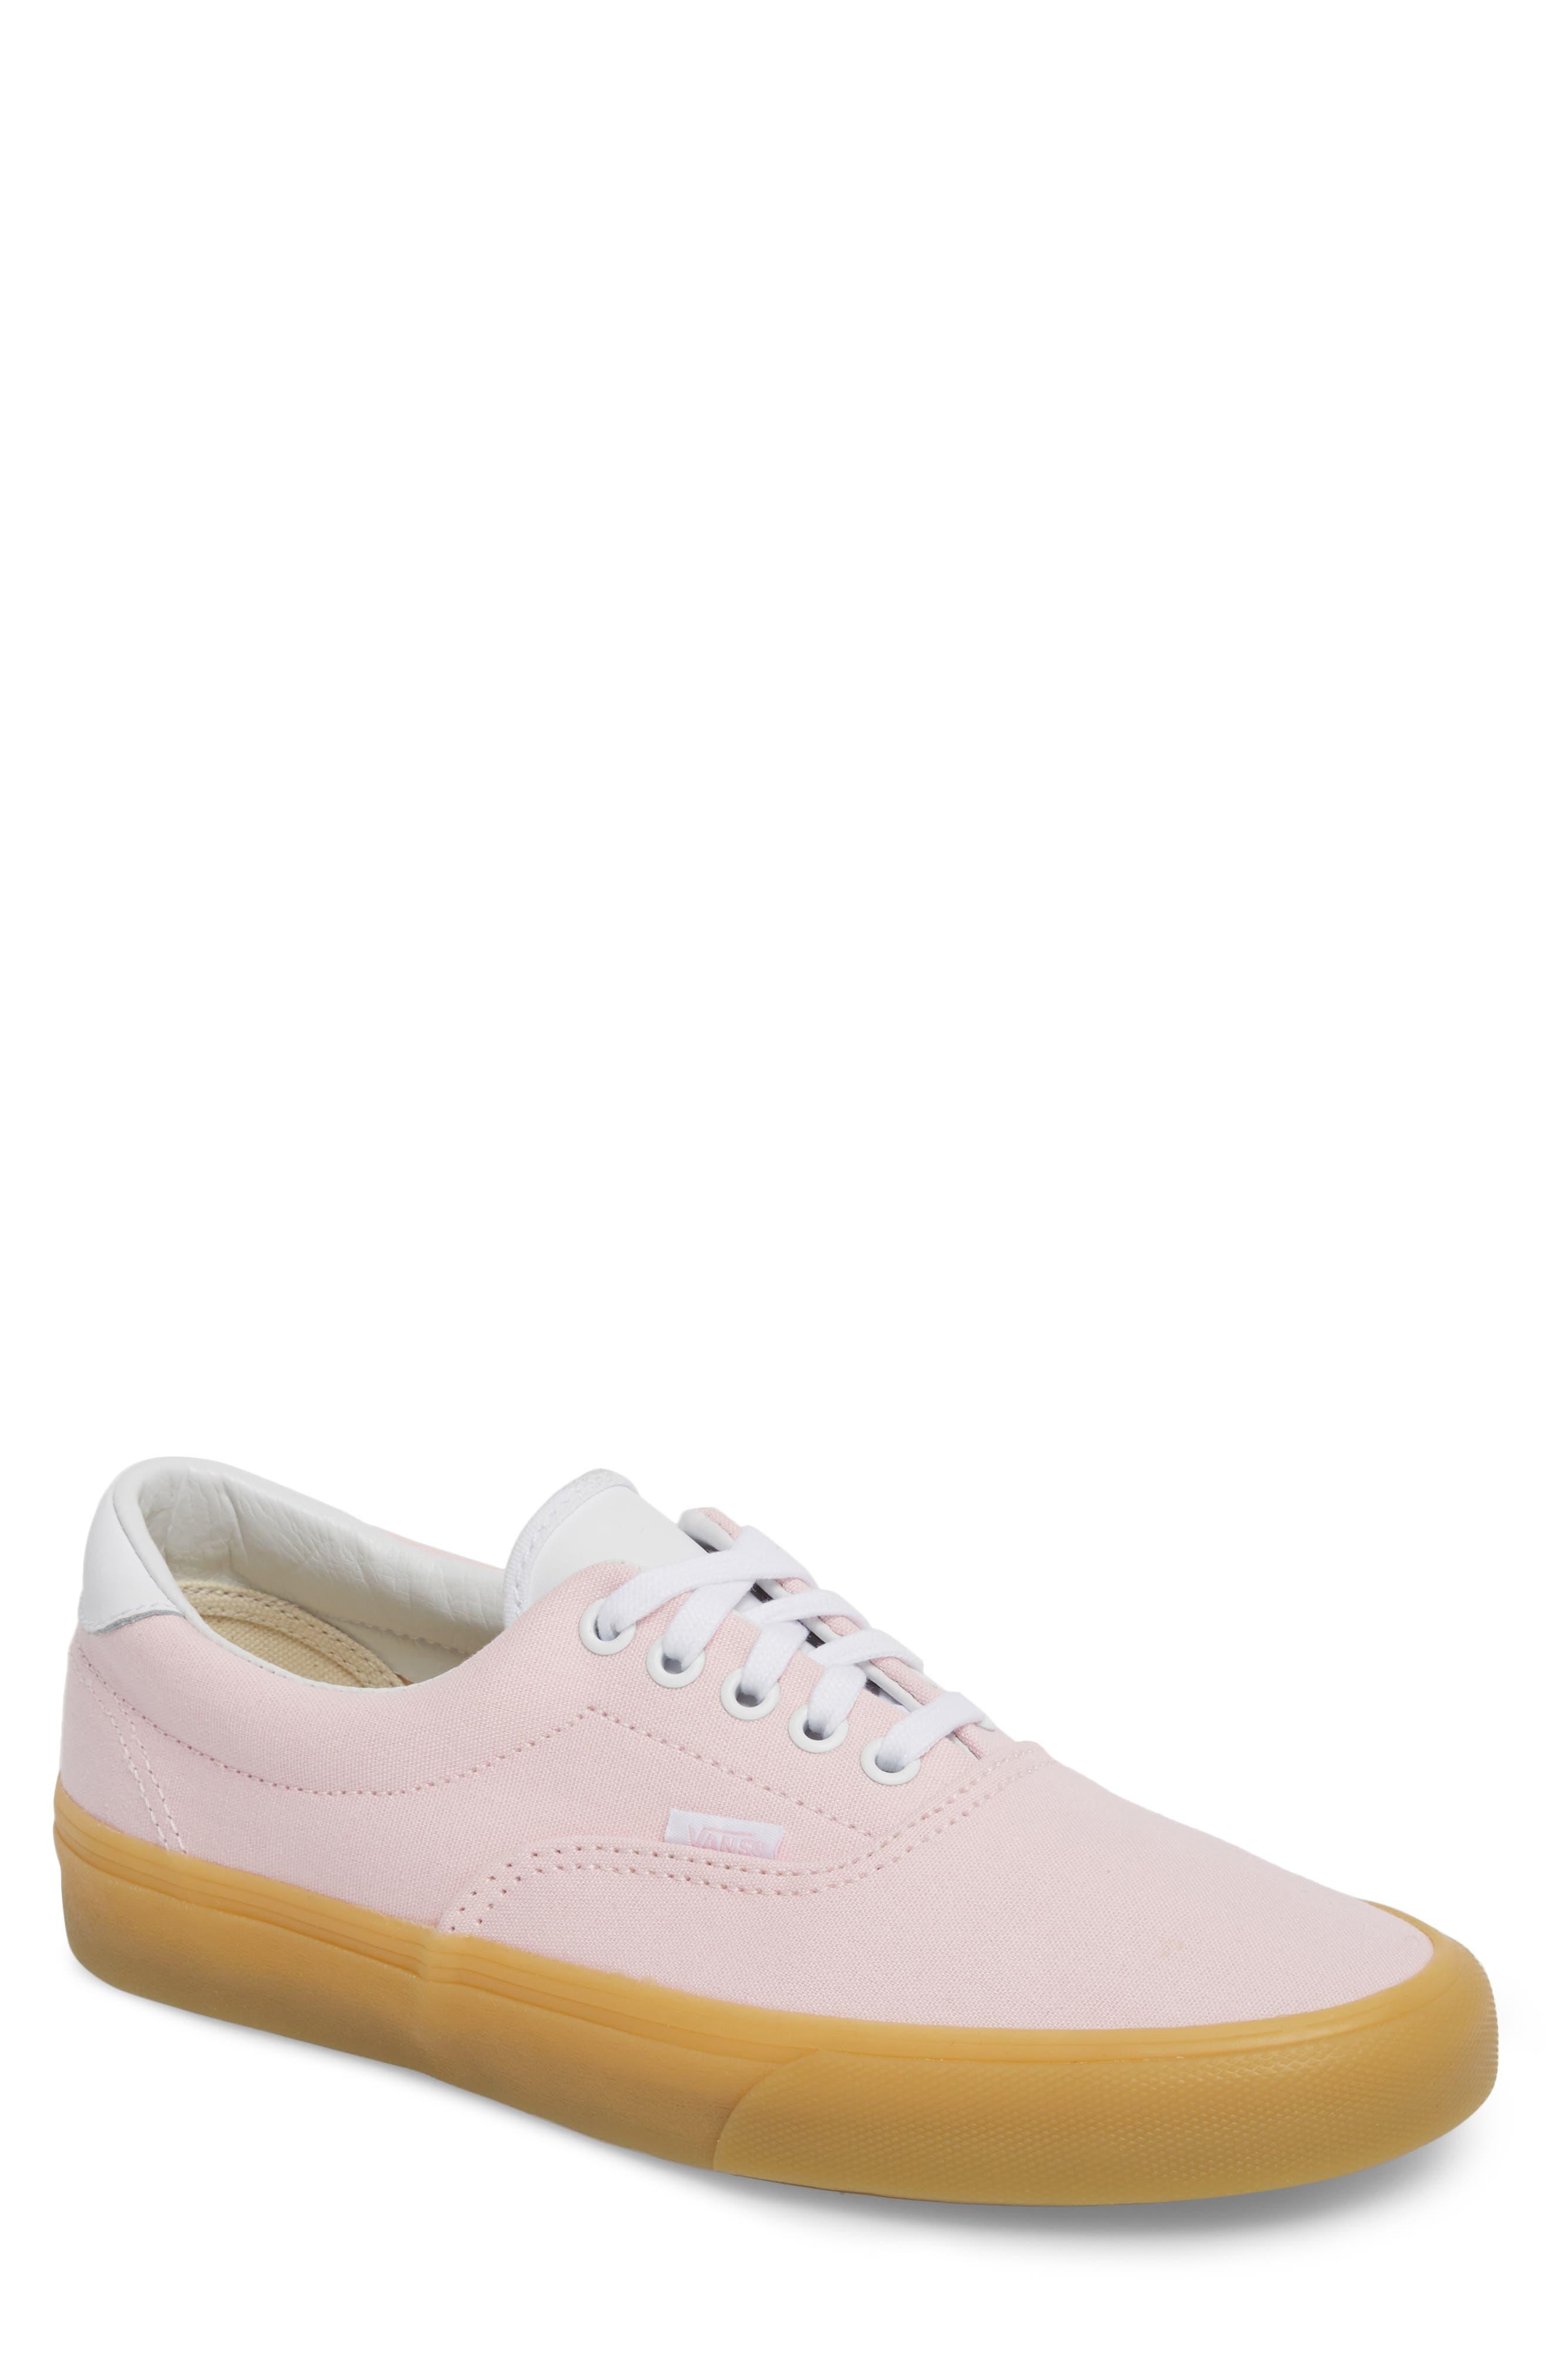 Era 59 Gum Sneaker,                             Main thumbnail 1, color,                             Chalk Pink